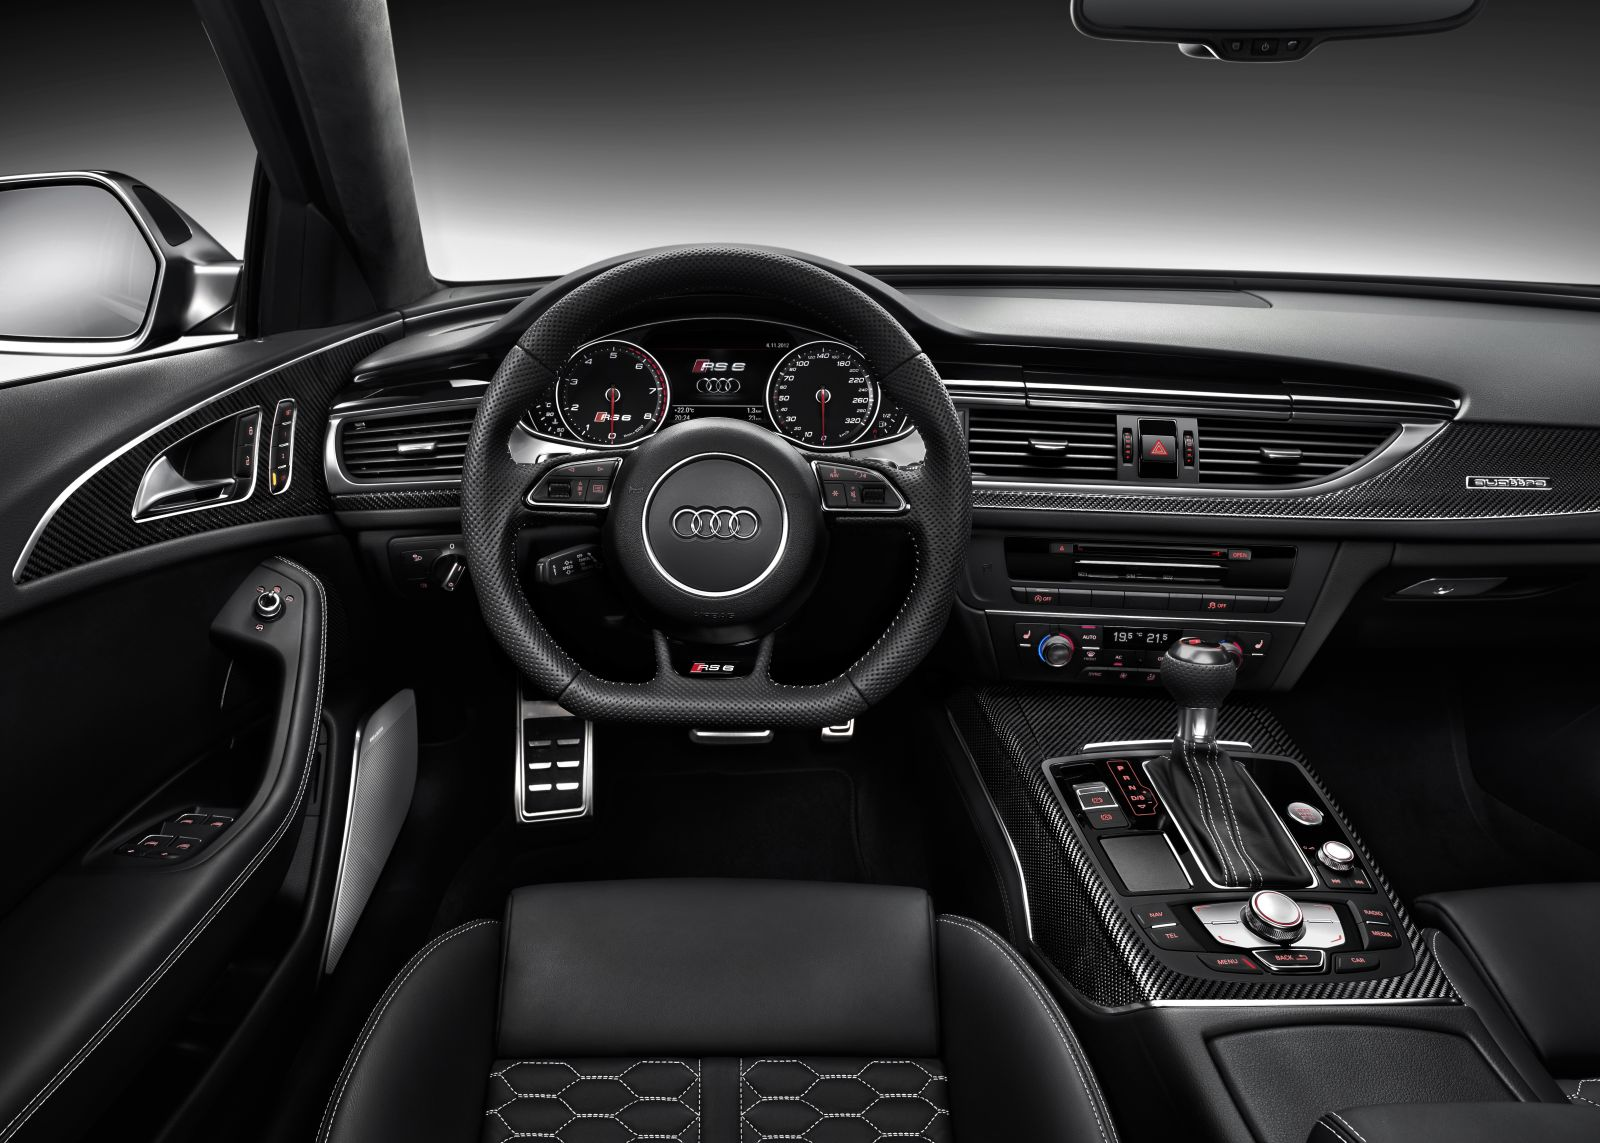 A4e Gallery Audi A6 C7 Audi Rs6 C7 Avant 2013